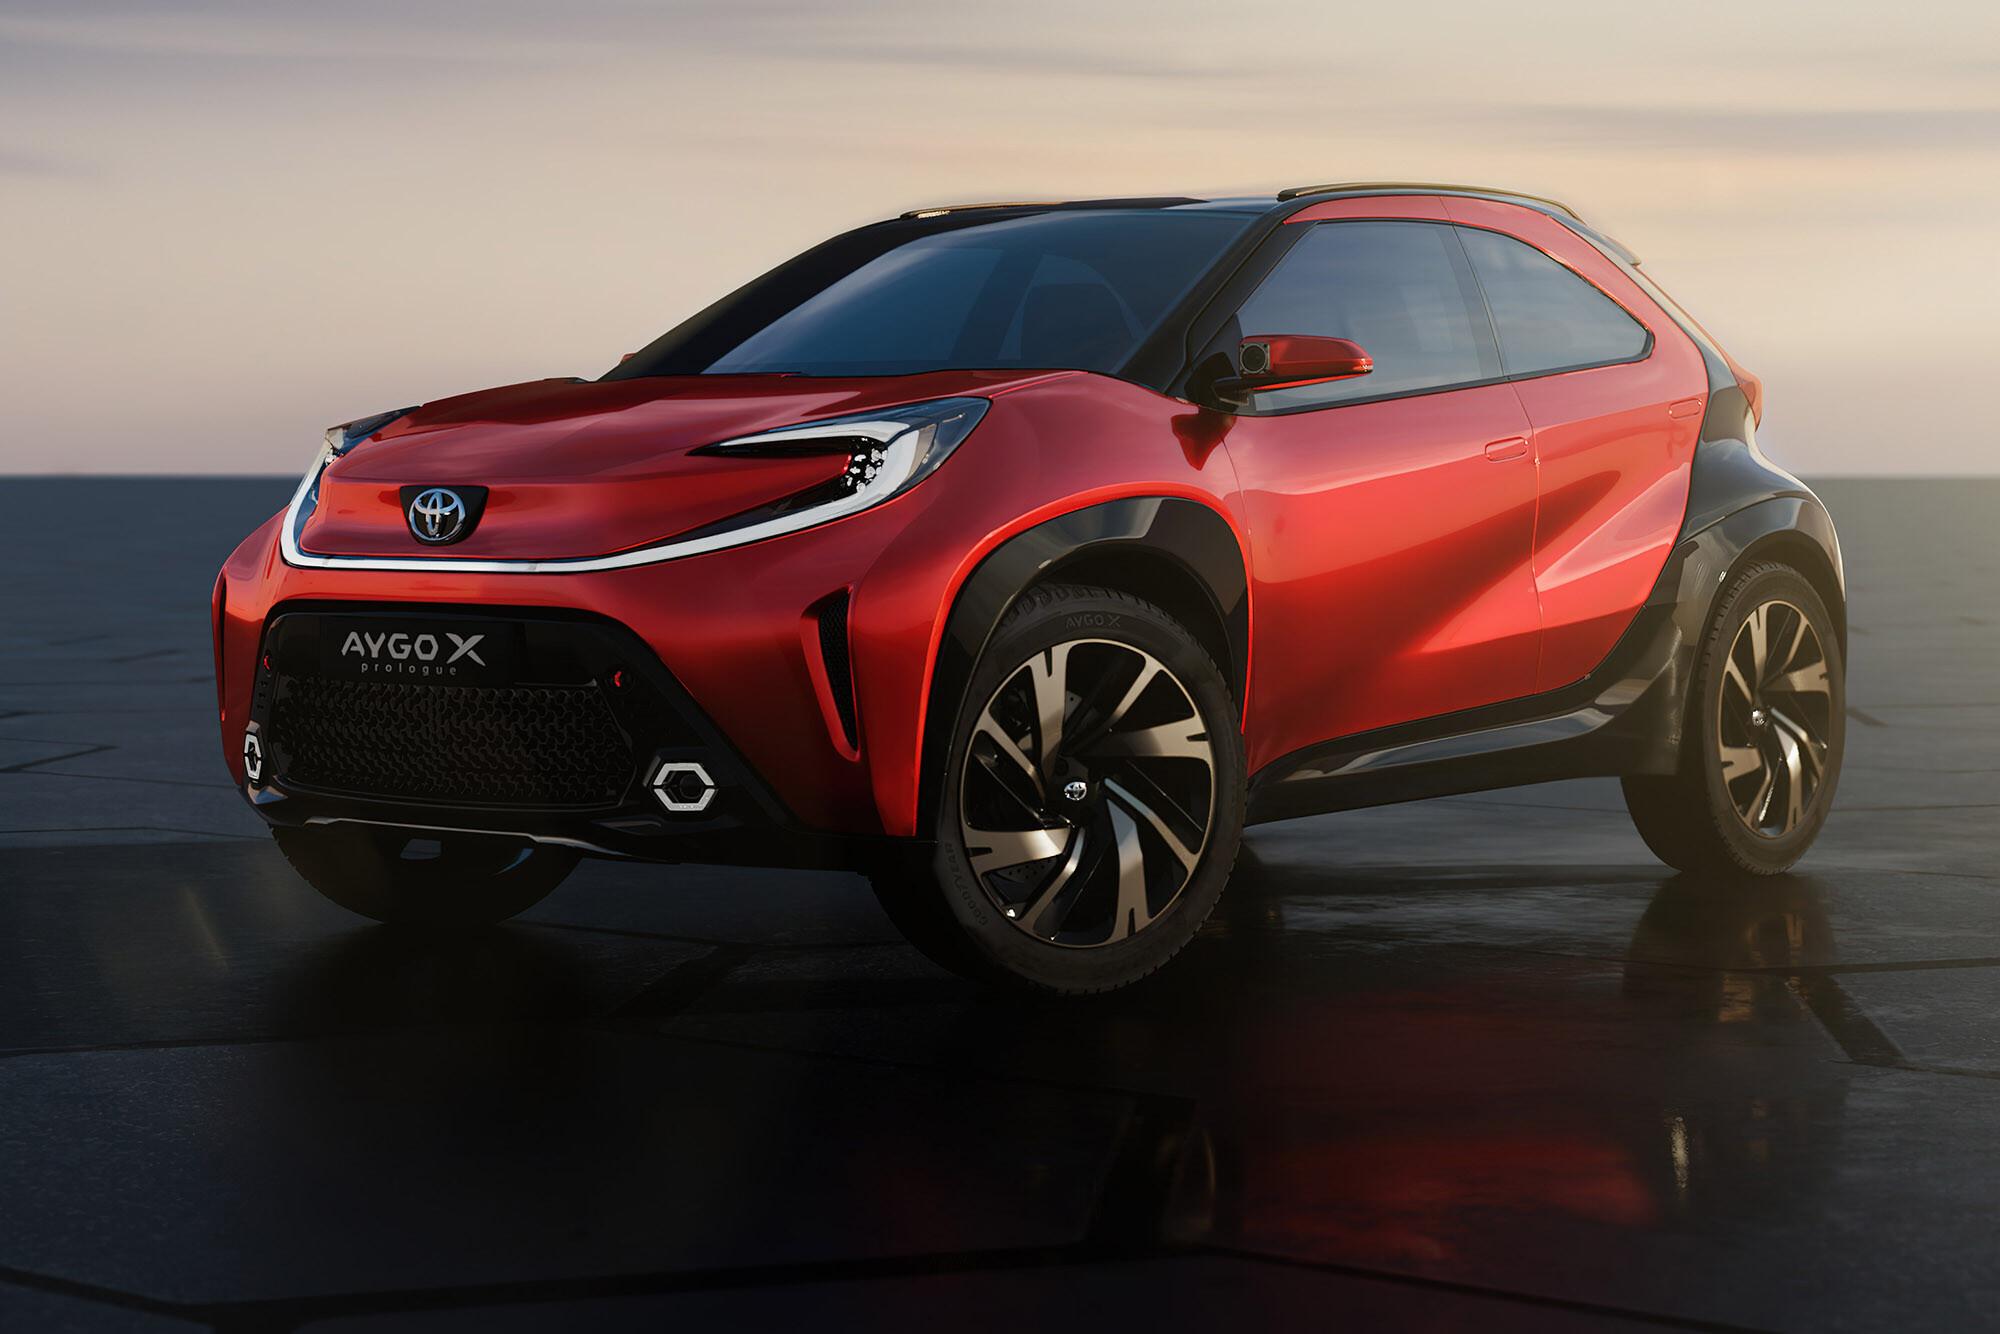 2021 Toyota Aygo X Concept Toyota Aygo Cross Concept 4 Jpeg